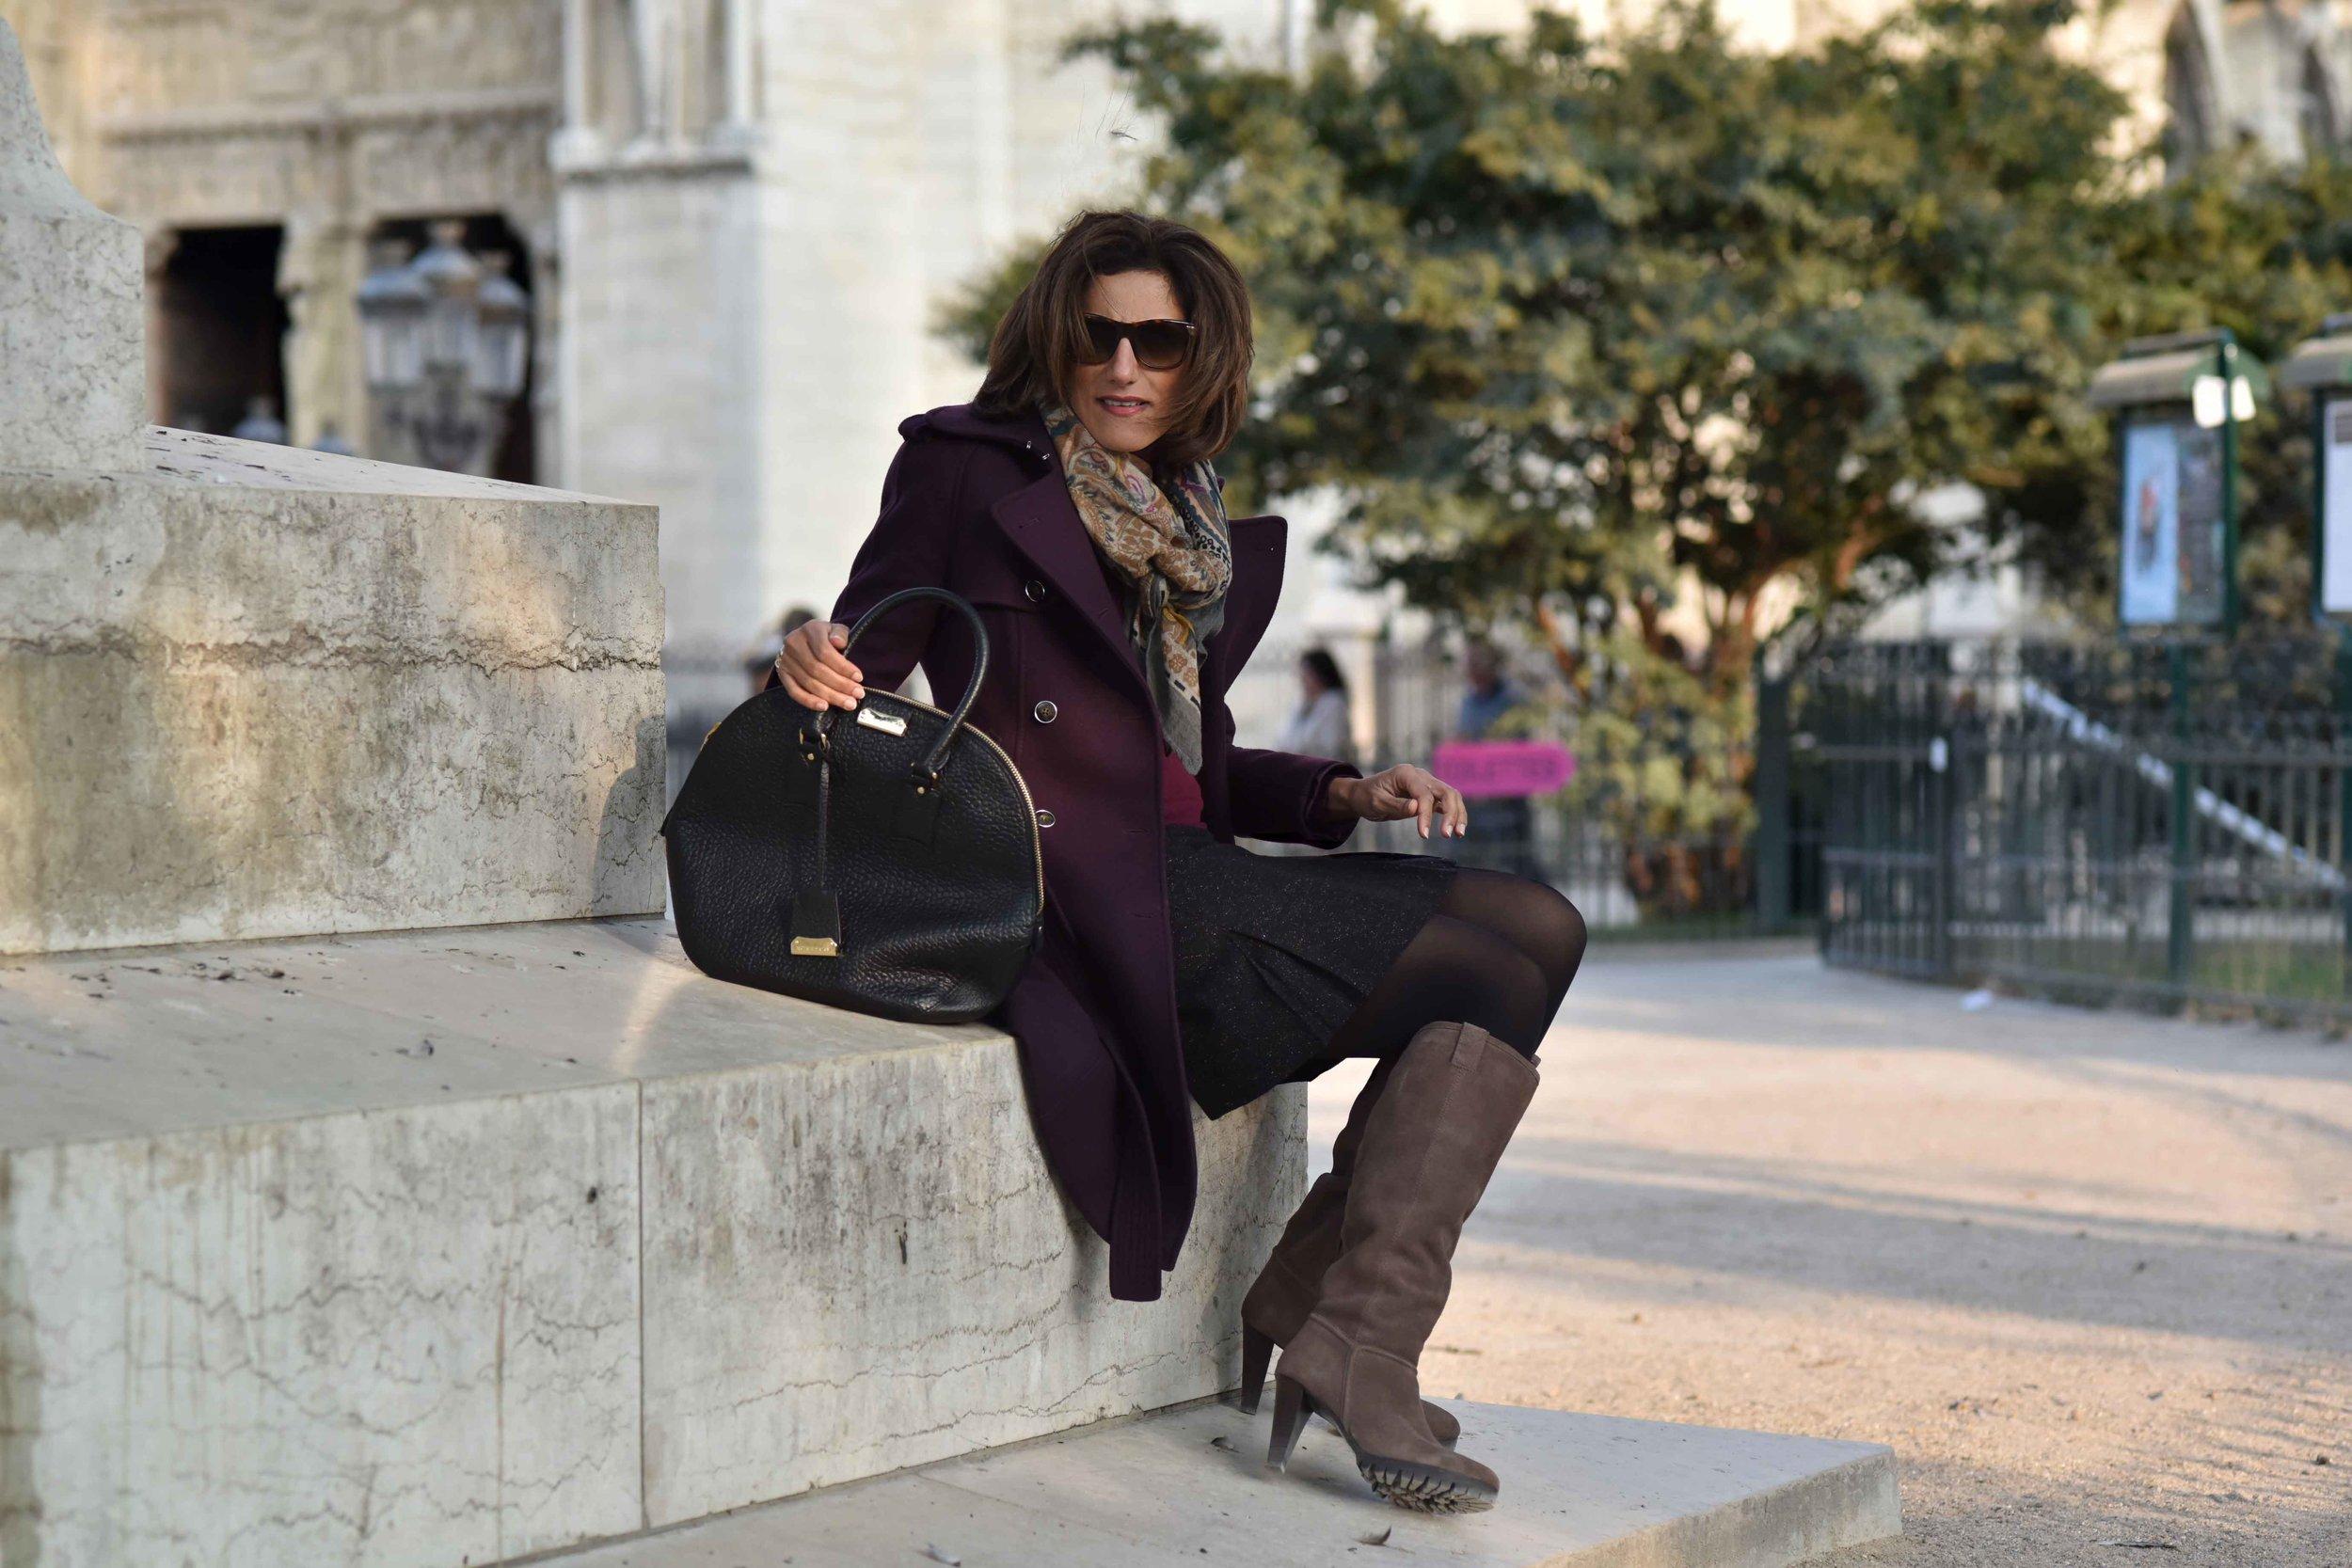 Karen Millen fall winter coat, Karen Millen boots, Talbots skirt, Ralph Lauren polo neck sweater, Burberry bag, Hallhuber scarf, Guccci sunglasses, Notre-Dame, Paris. Image©sourcingstyle.com